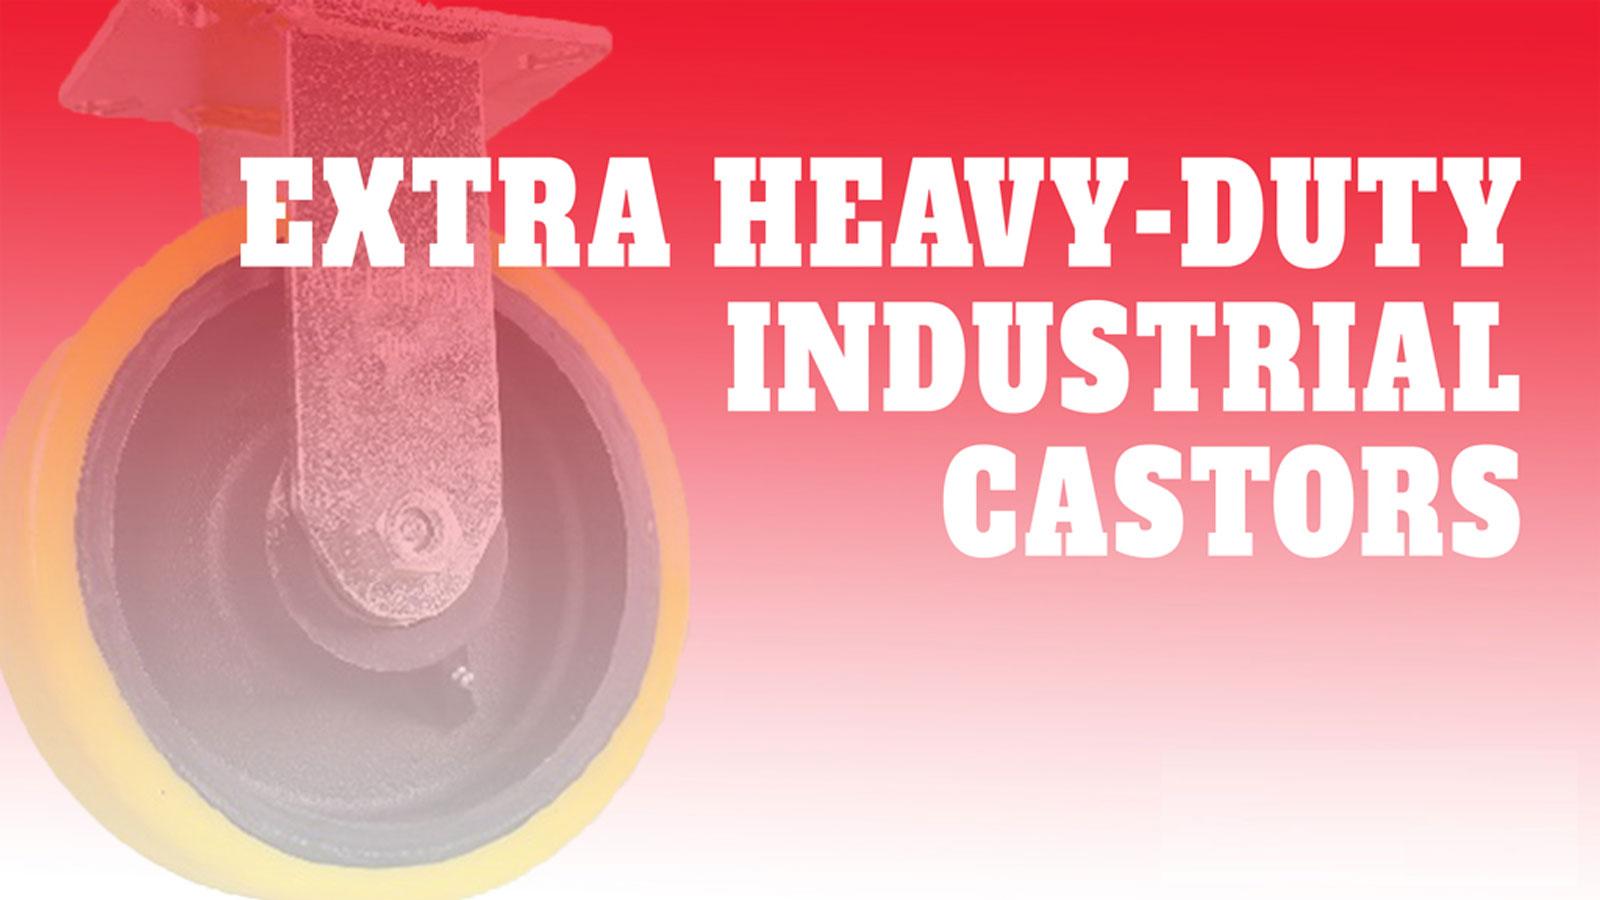 Castor-Extra-Heavy-Duty-Industrial